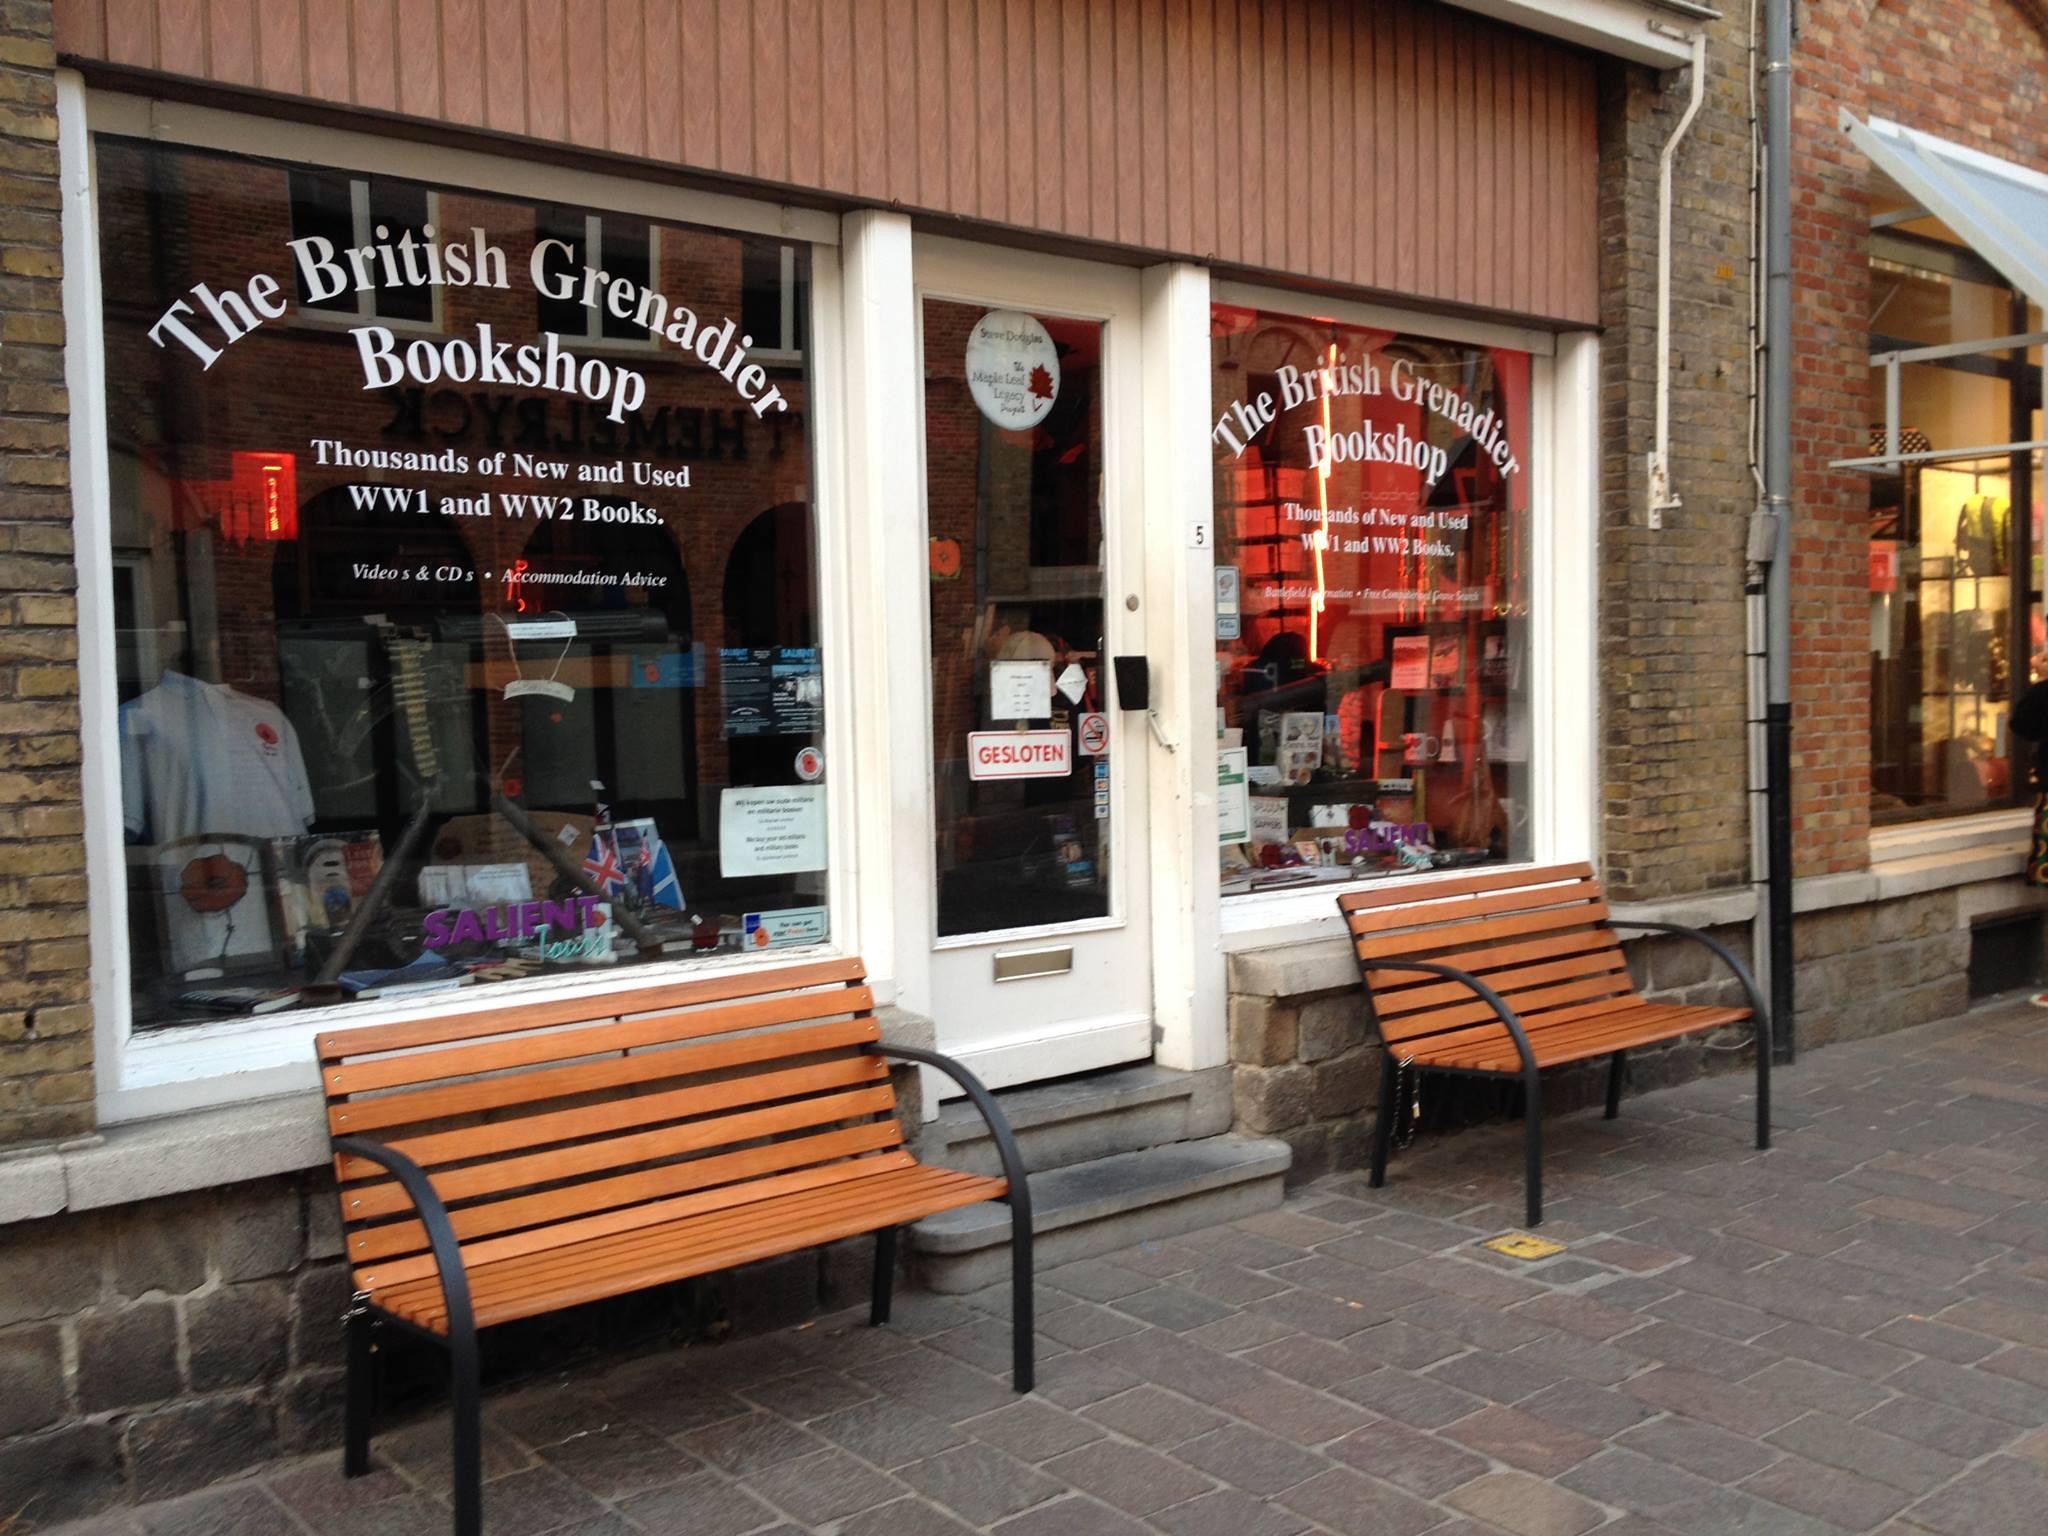 BritishGrenadierBookshop.jpg